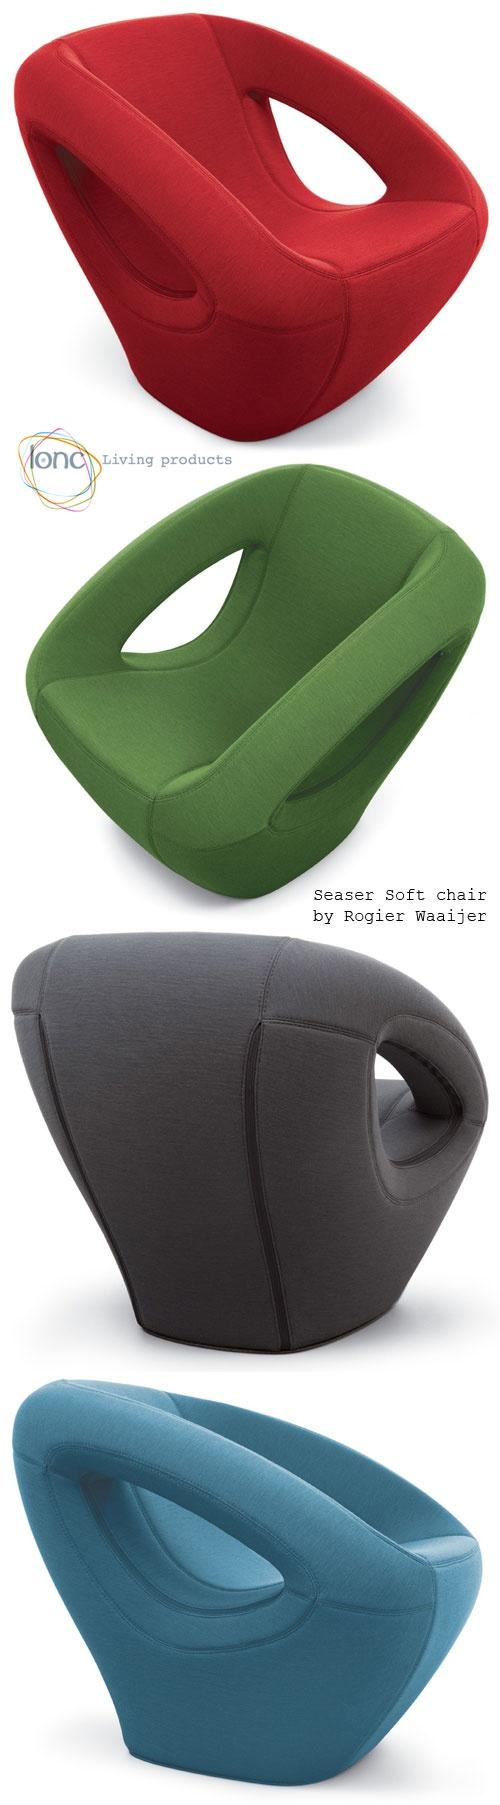 Seaser Soft chair by Rogier Waaijer